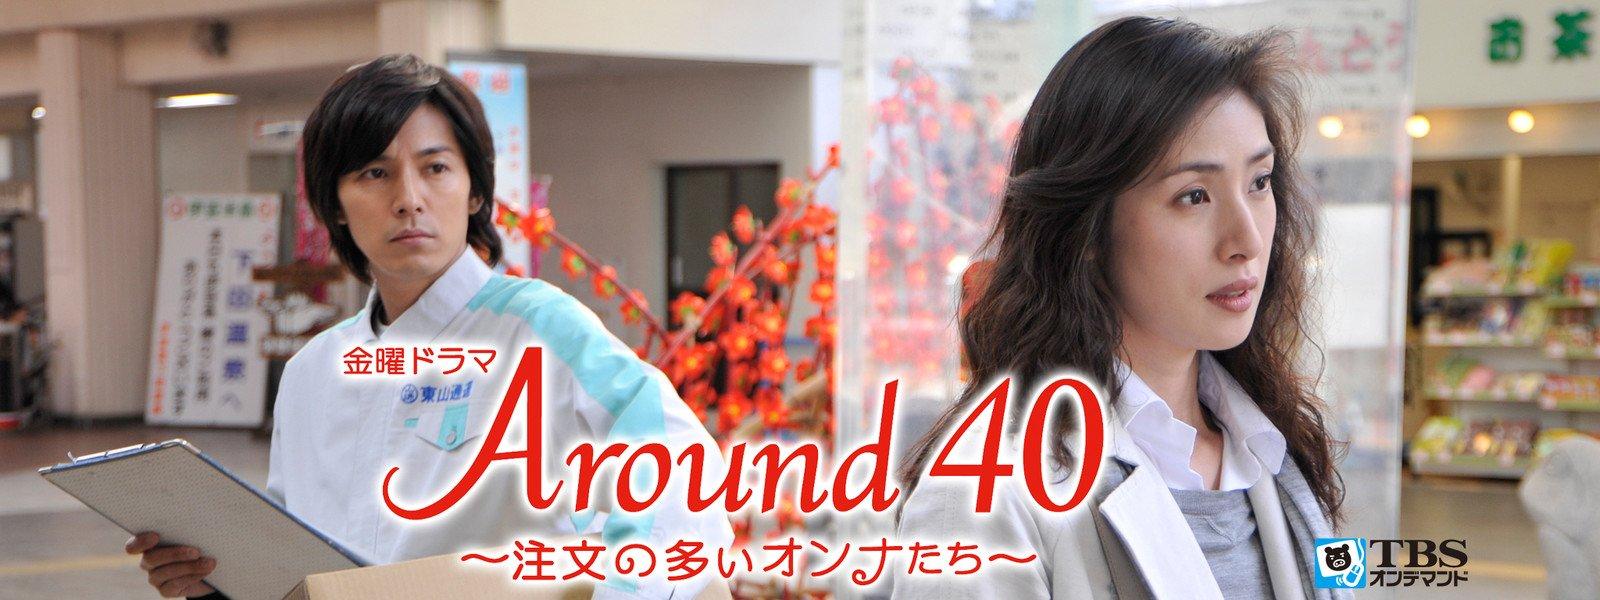 Around40 ~注文の多いオンナたち~ ドラマ에 대한 이미지 검색결과